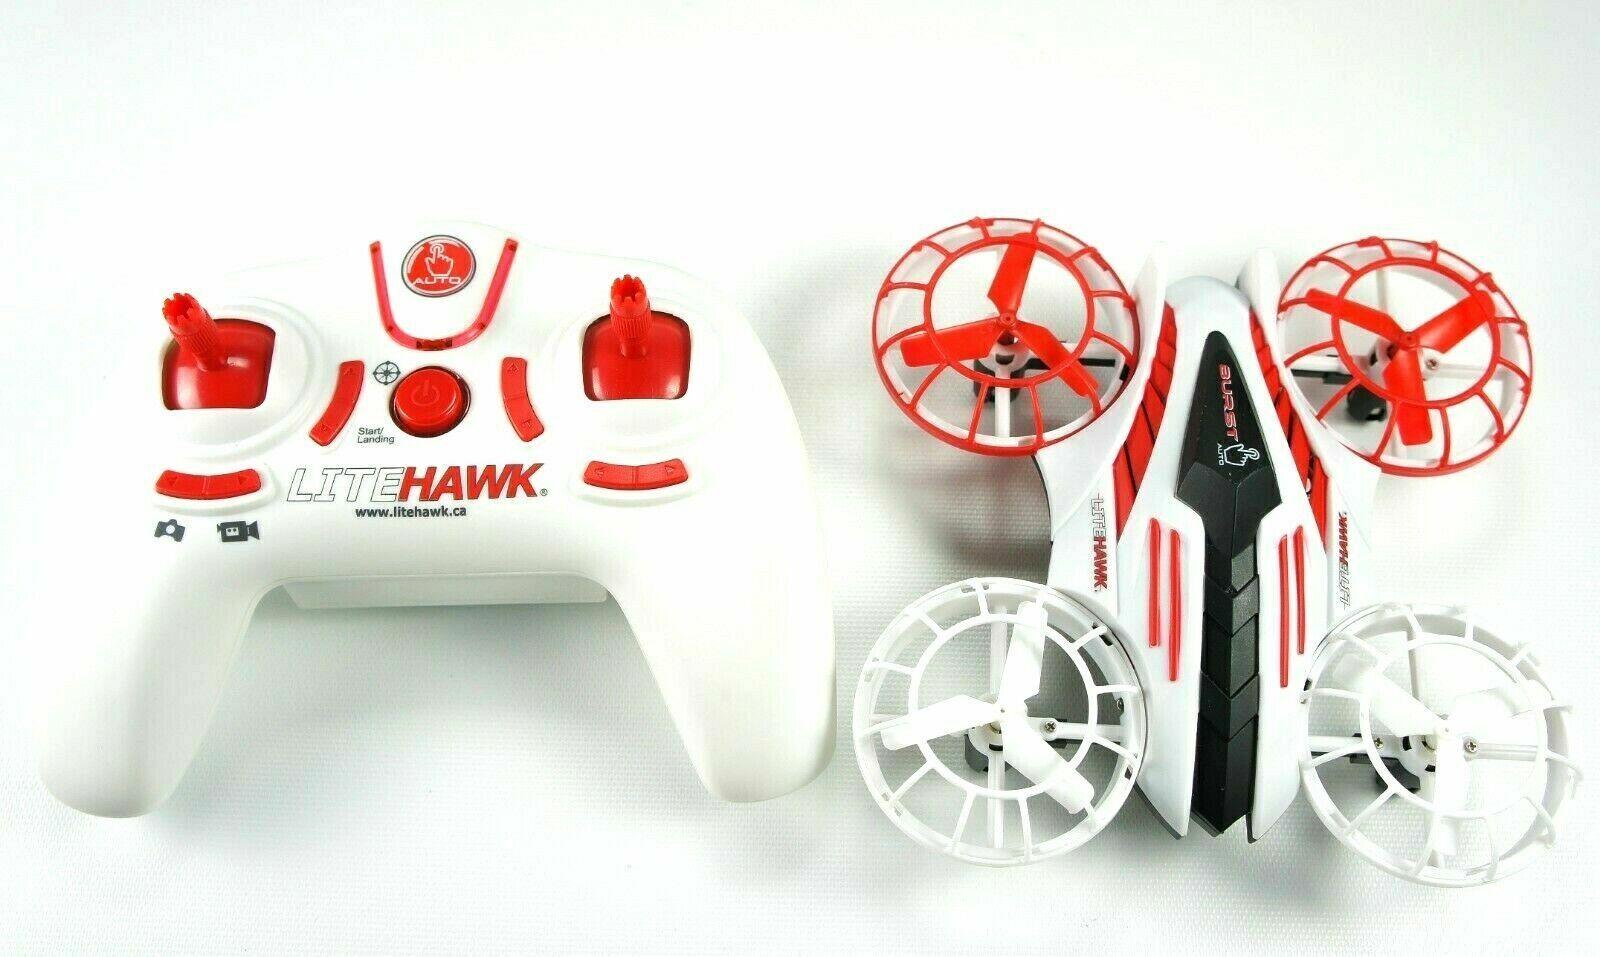 LiteHawk BURST AUTO AUTO AUTO AUTO Flight Functions with